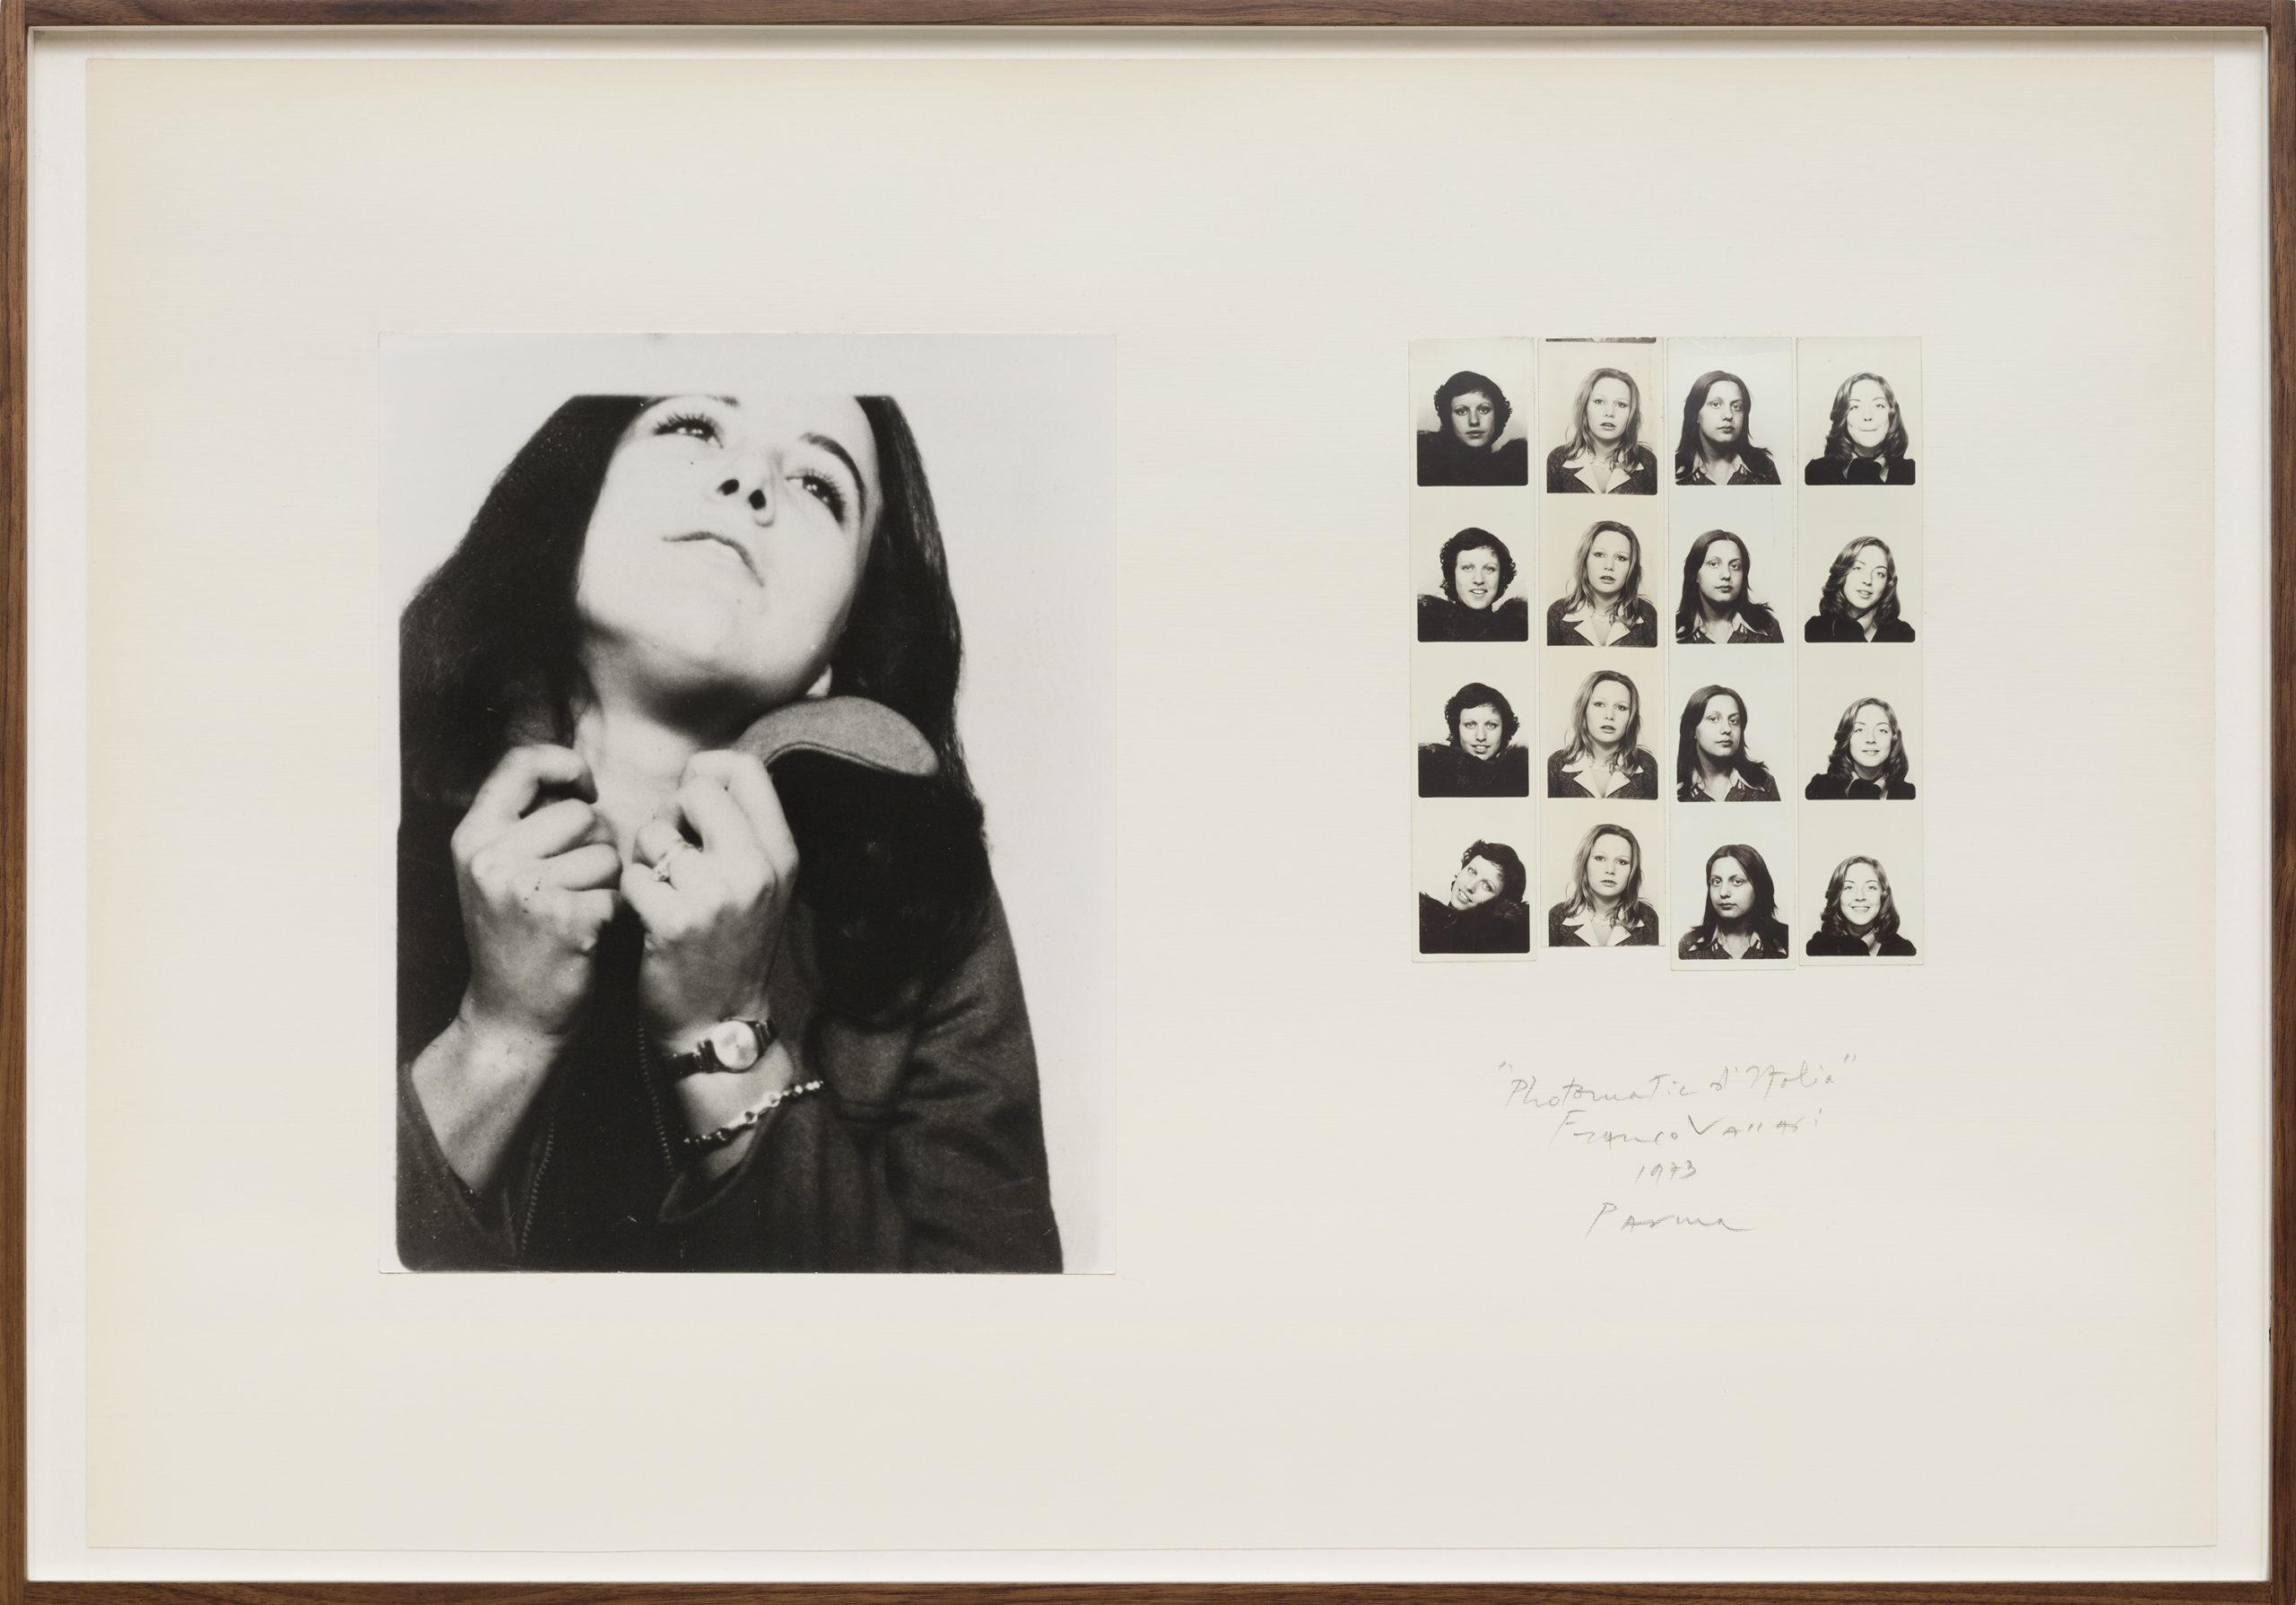 Photomatic d'Italia (Parma), 1973. Courtesy the artist and P420, Bologna